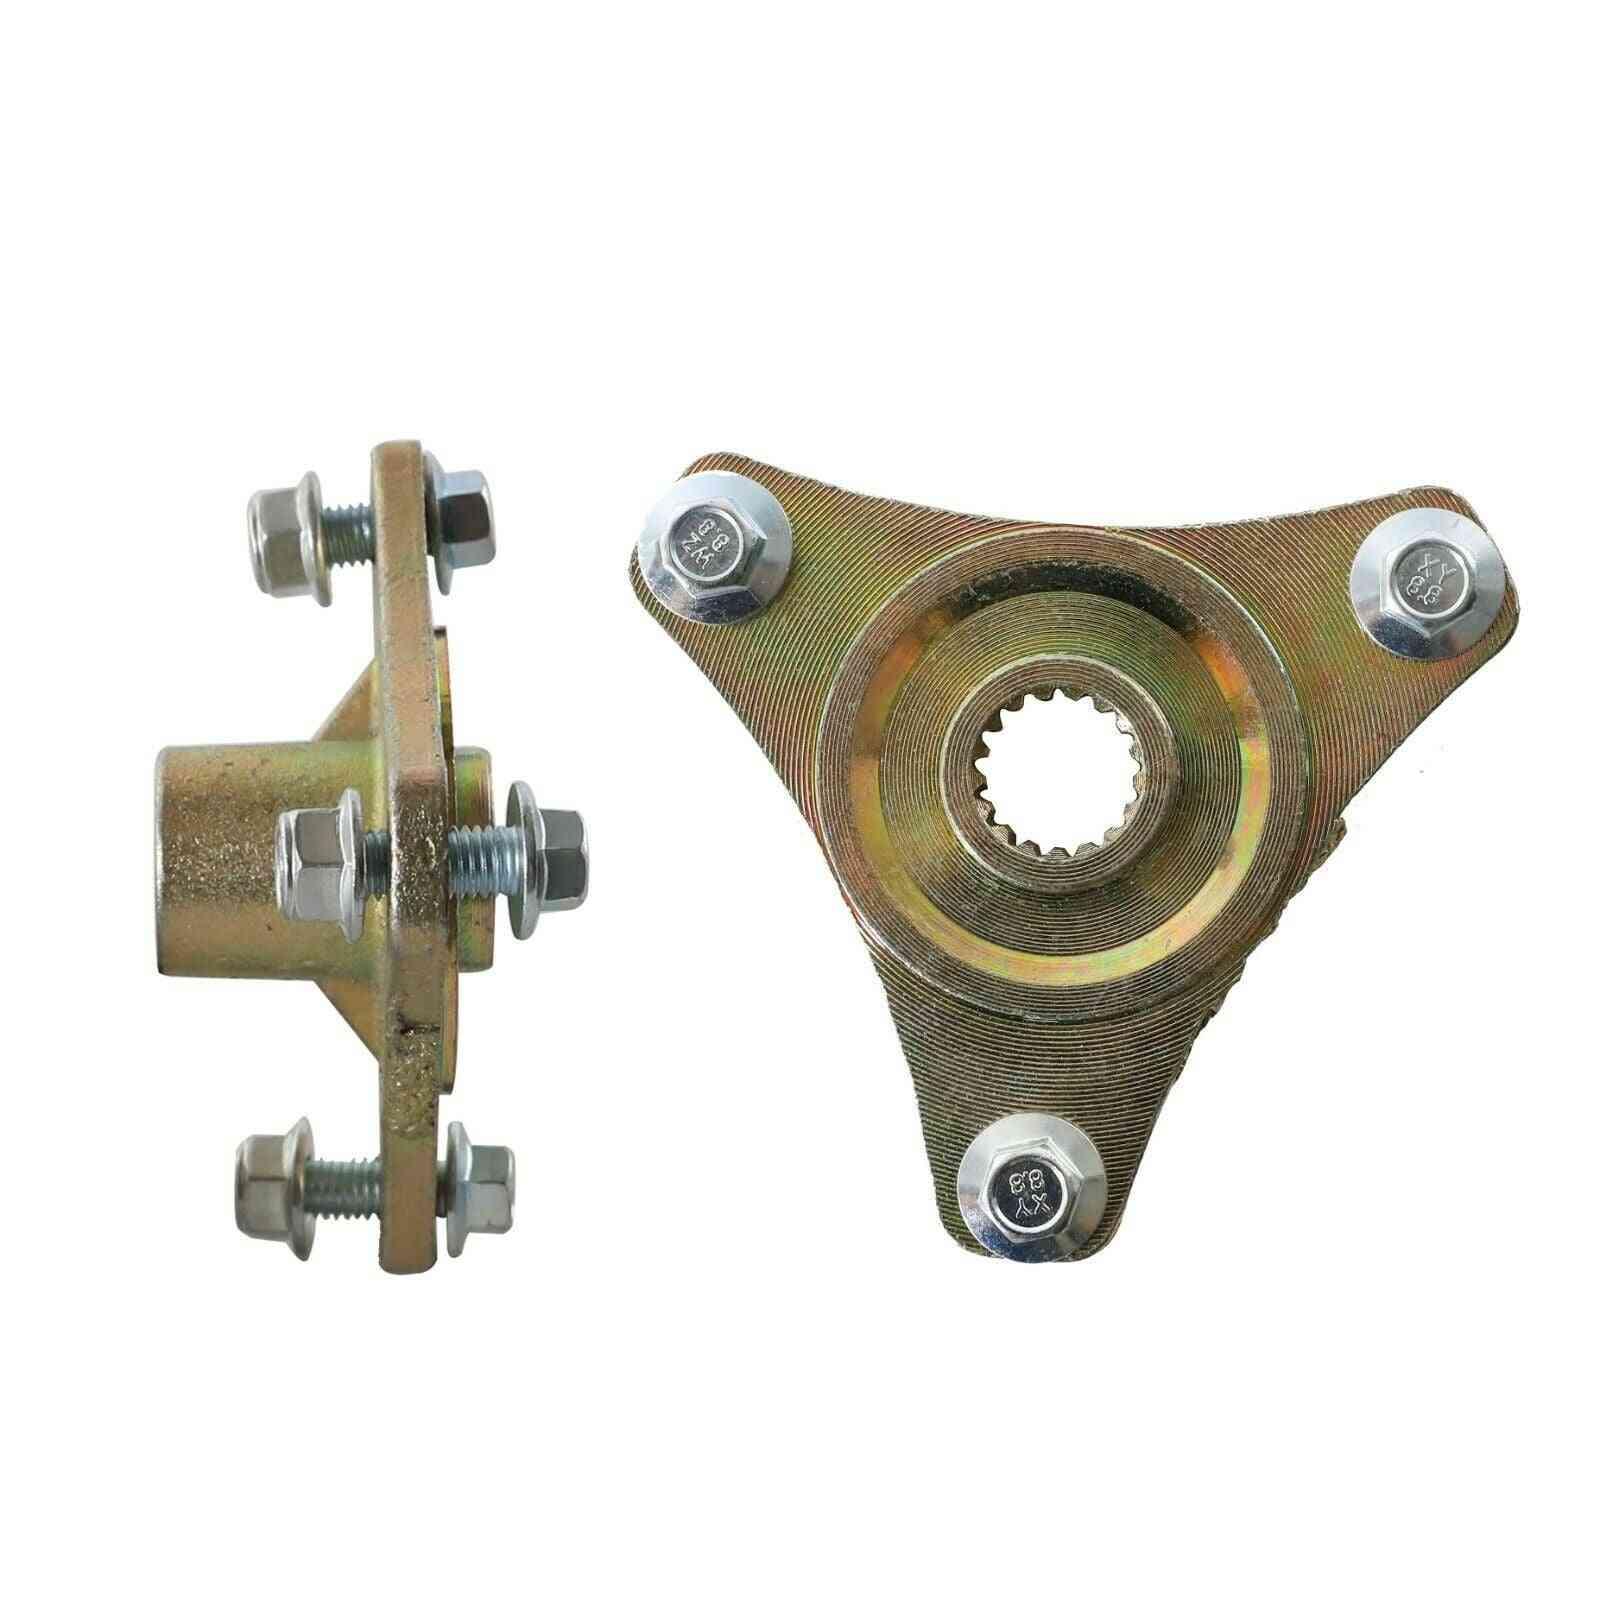 Pair 3 Stud Rear Axle Wheel Hubs For Go Kart Racing